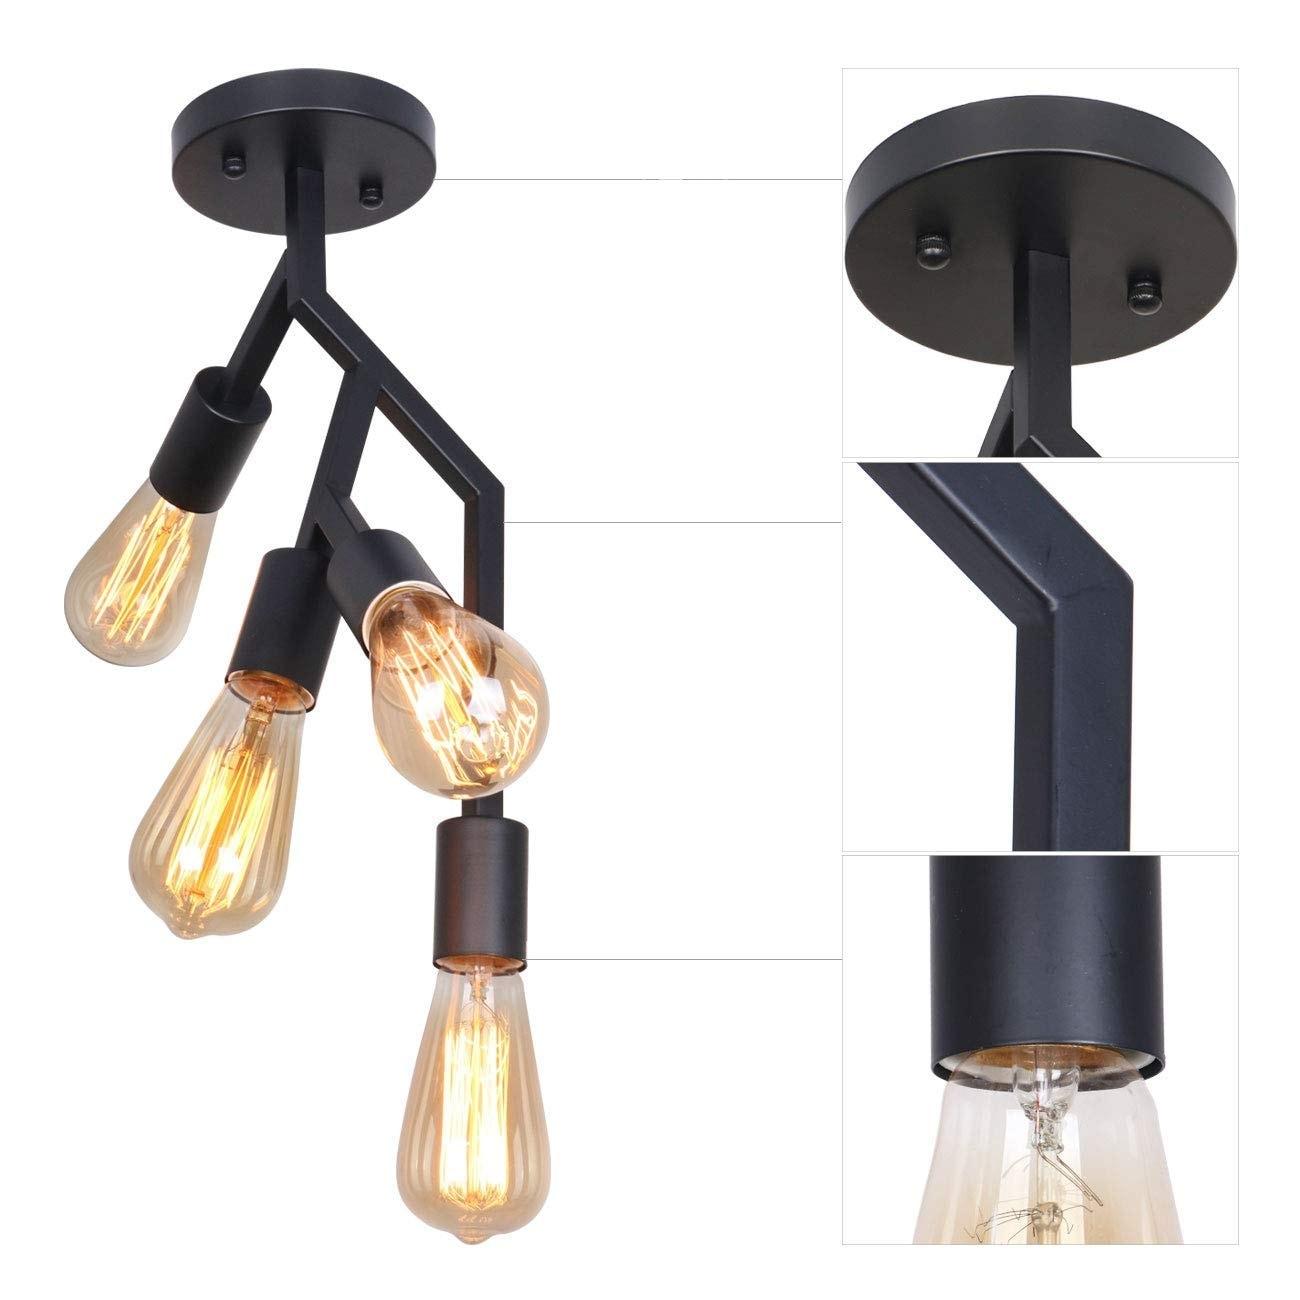 4 light vintage industrial black decorative flush mount ceiling light fixture